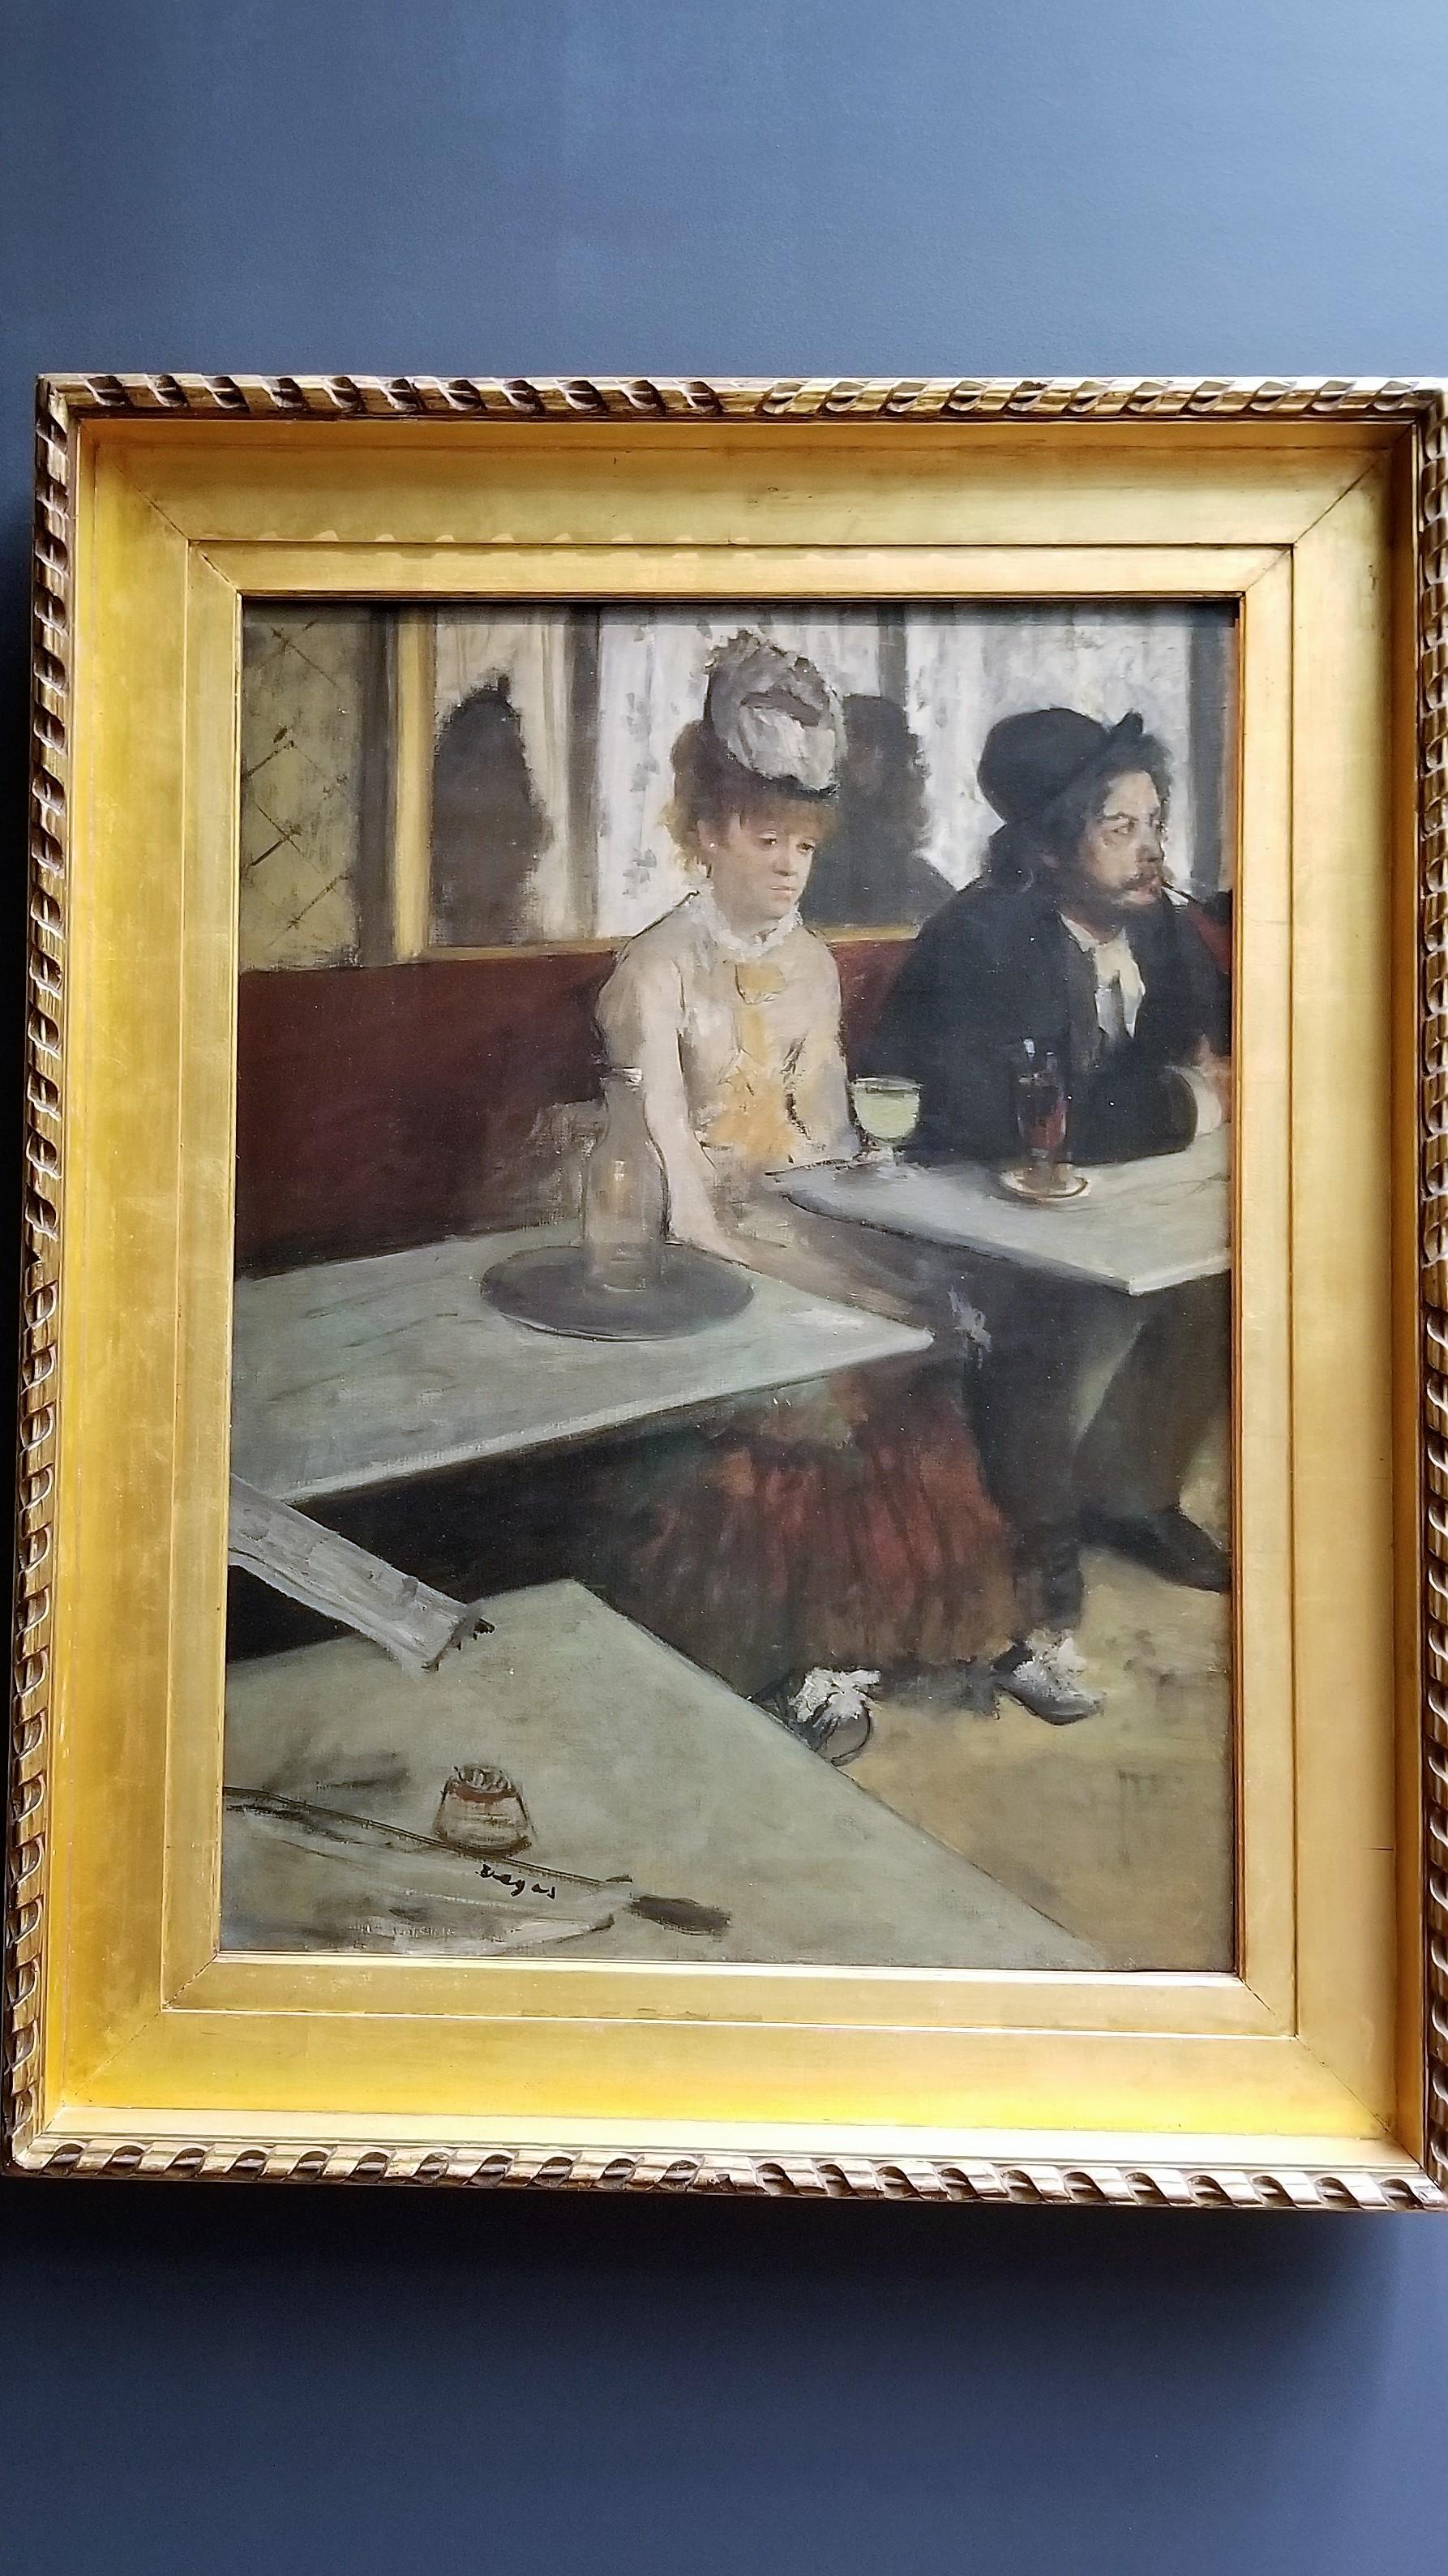 Dans un café, dit aussi l'Absinthe (In a Café, also called Absinthe)